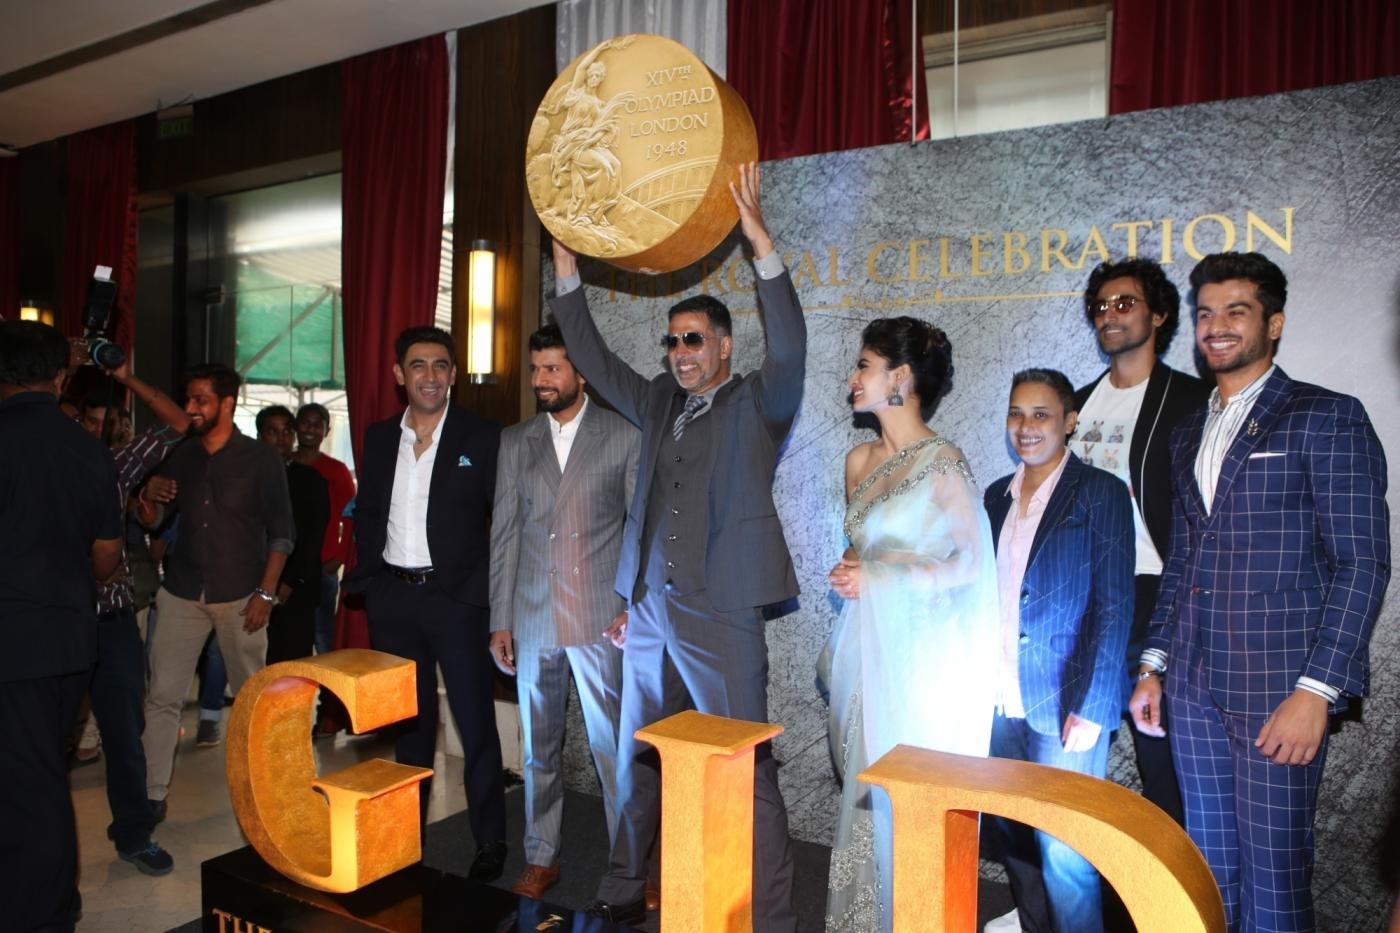 Mumbai: Actors Akshay Kumar, Mouni Roy, Amit Sadh, Kunal Kapoor, Vineet Kumar Singh with filmmaker Reema Kagti and others at the launch of the first song from upcoming film 'Gold', titled 'Naino Ne Baandhi' in Mumbai on July 6, 2018. (Photo: IANS) by .